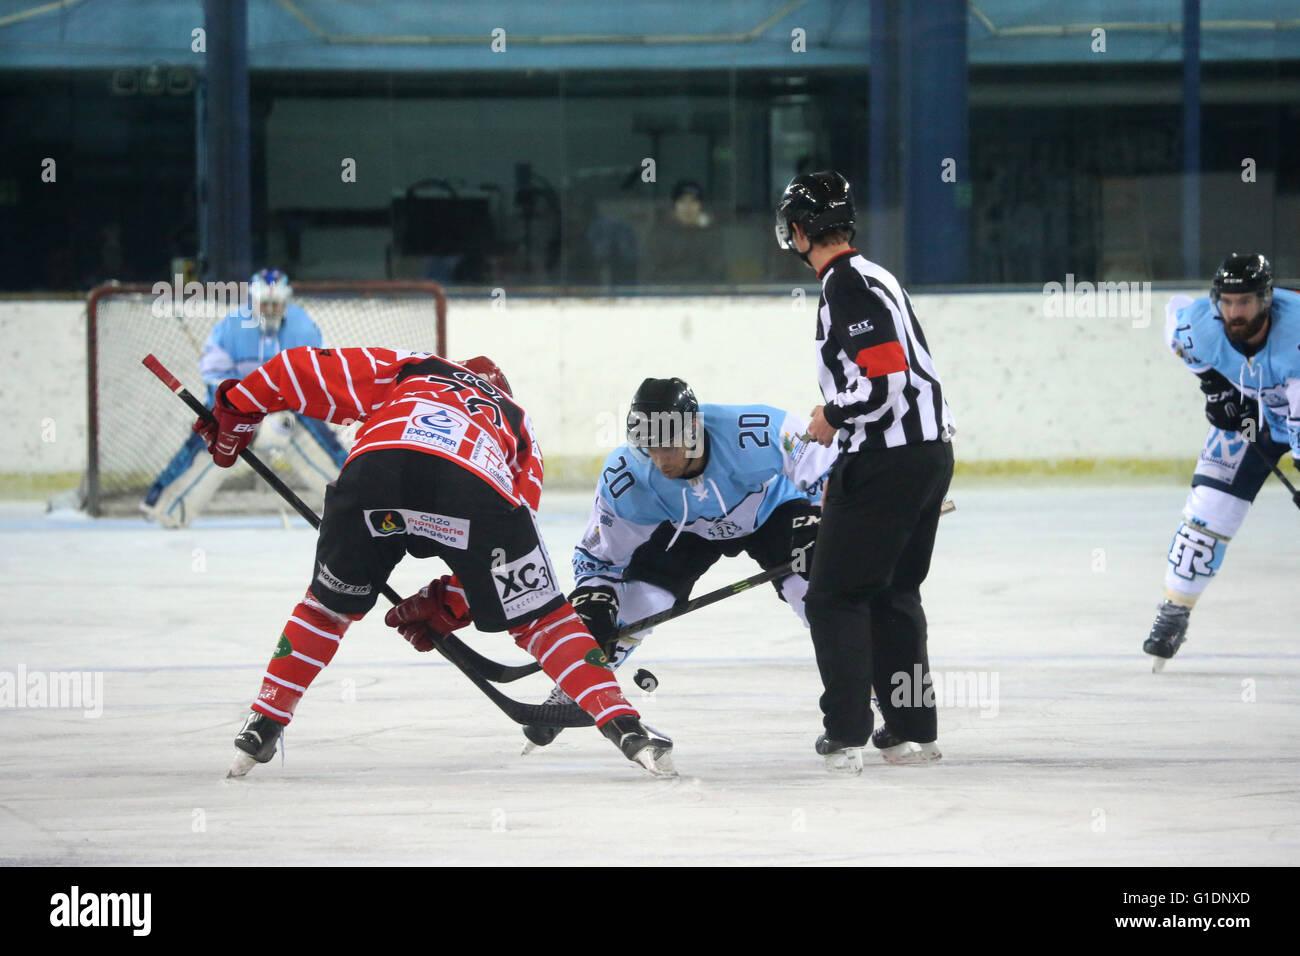 Ice Hockey match.  Mont-Blanc vs Tours.  Face-off. Saint-Gervais-les-Bains. France. - Stock Image